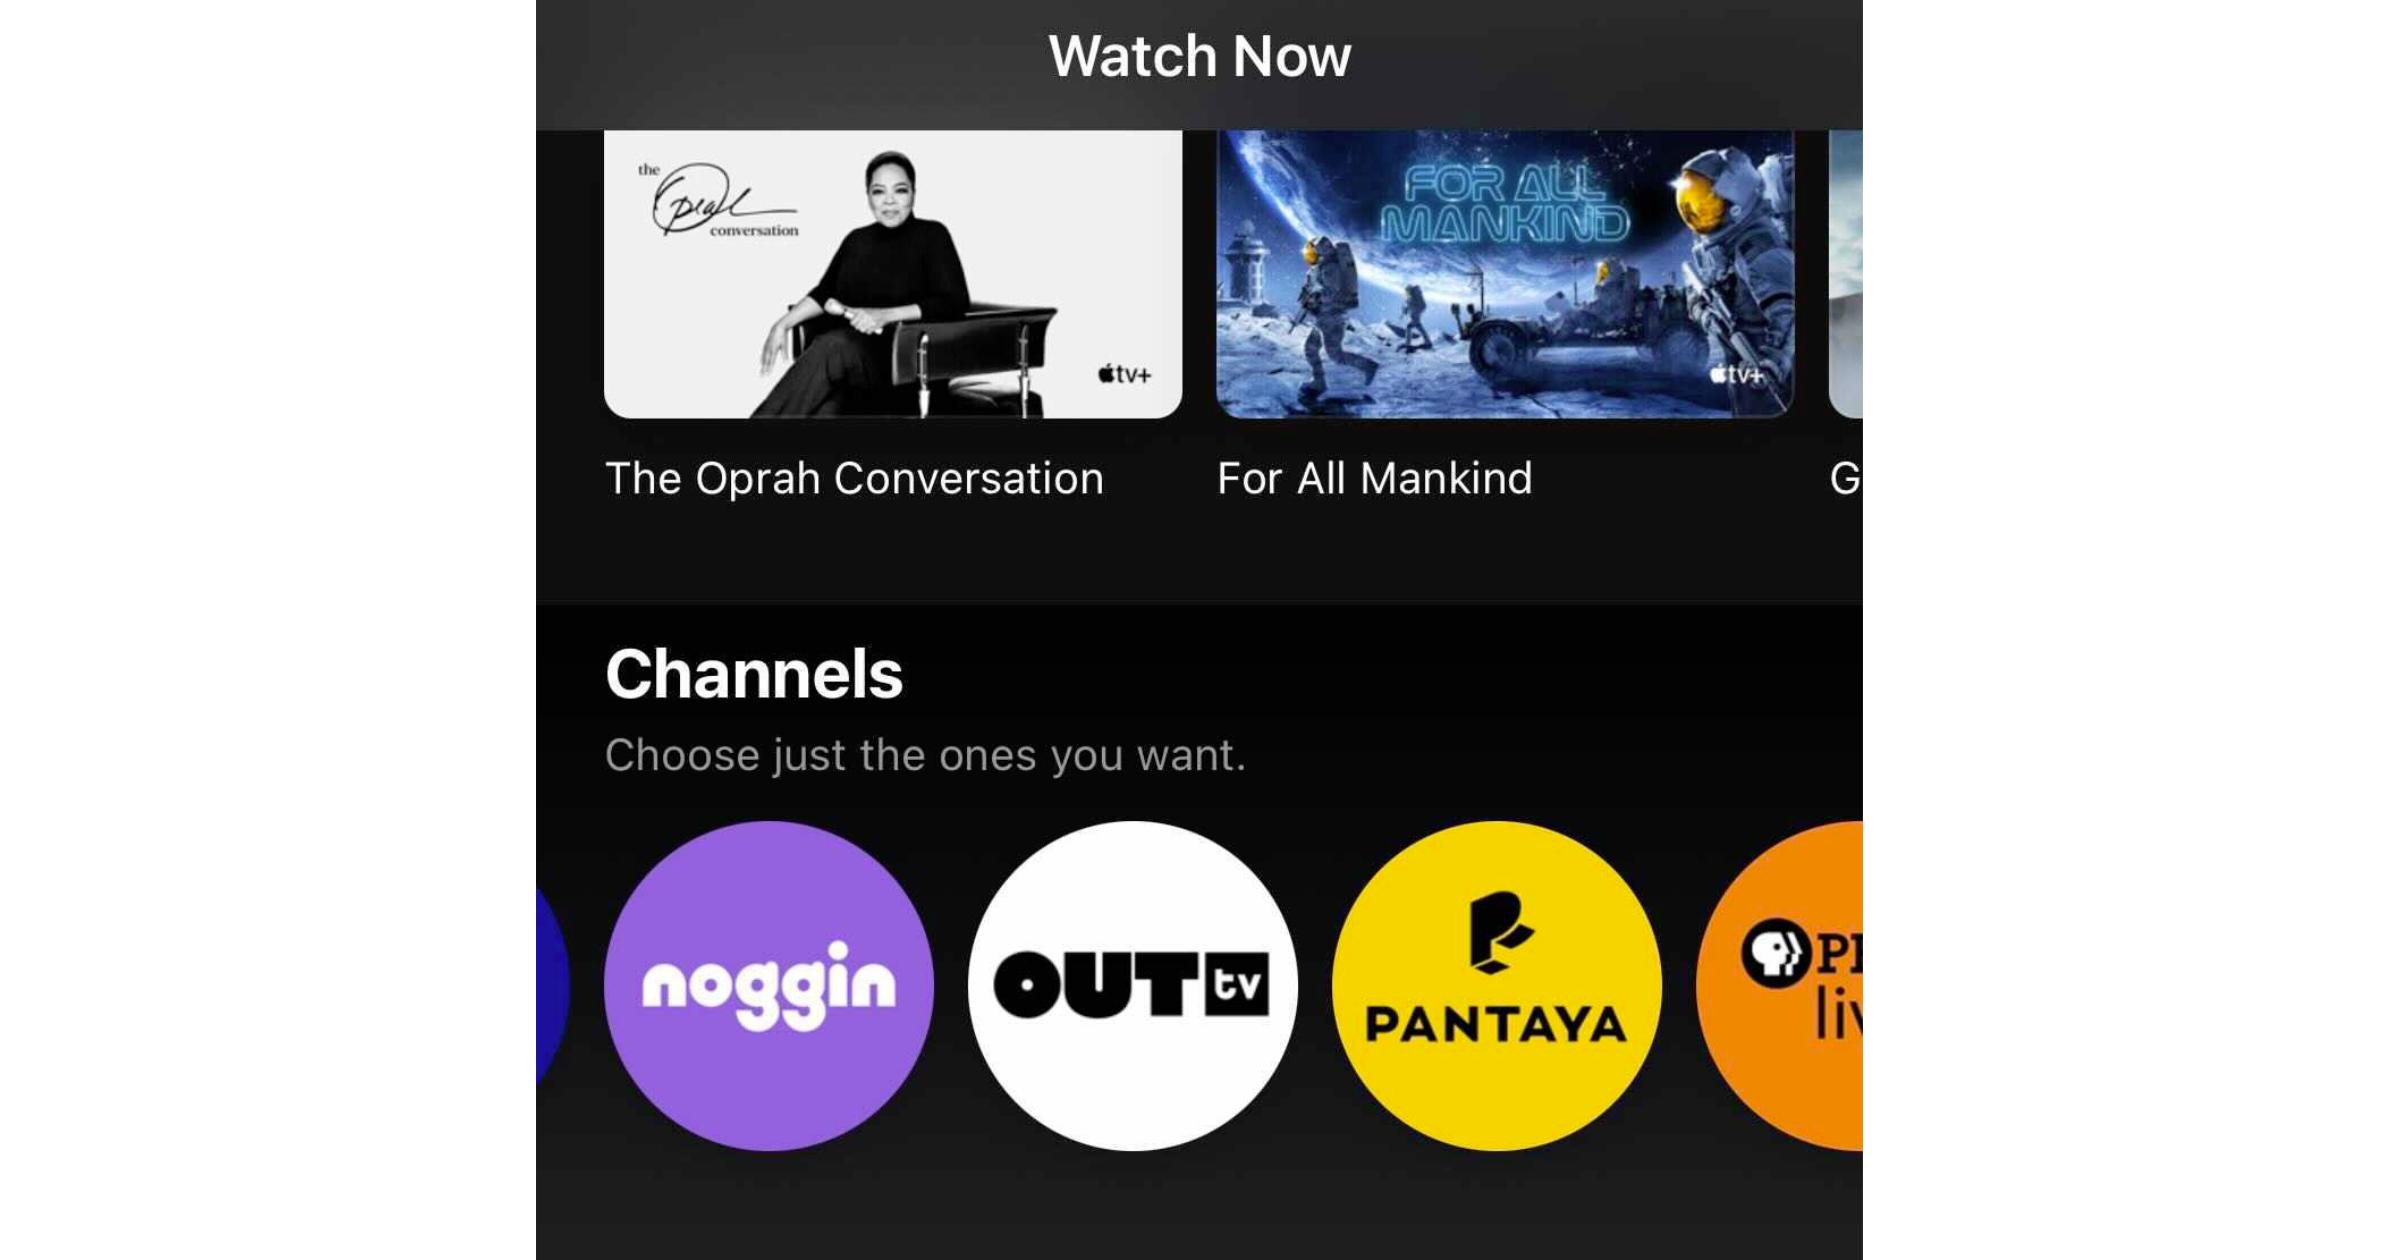 OUTtv Apple TV